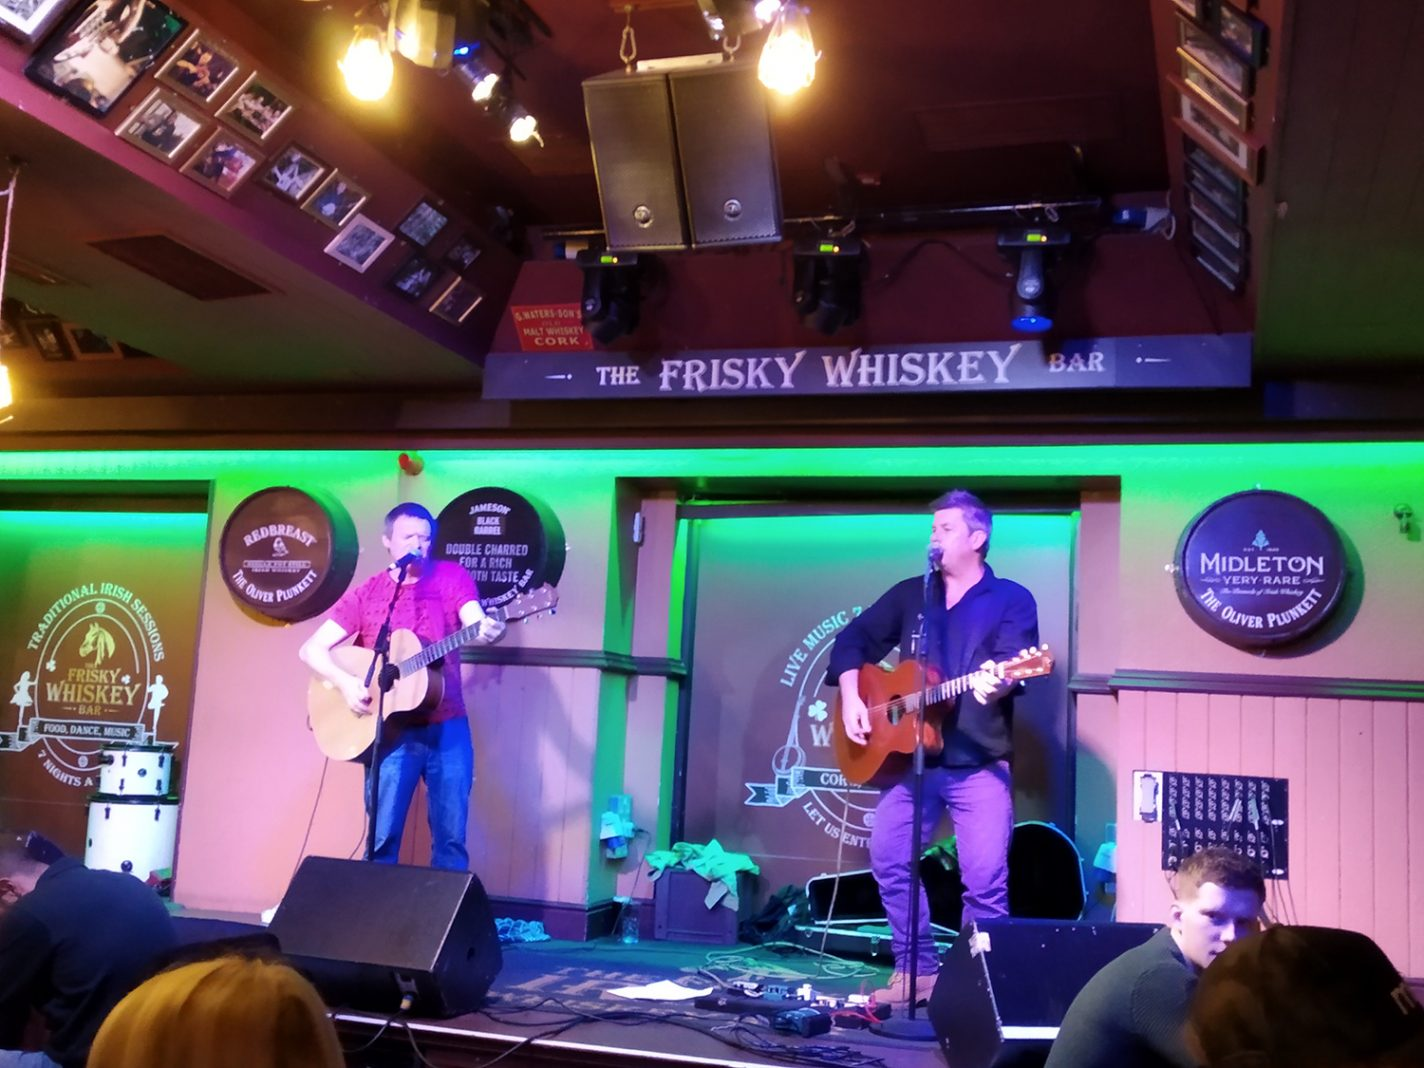 Livemuziek in The Frisky Whiskey Bar - stedentrip Cork